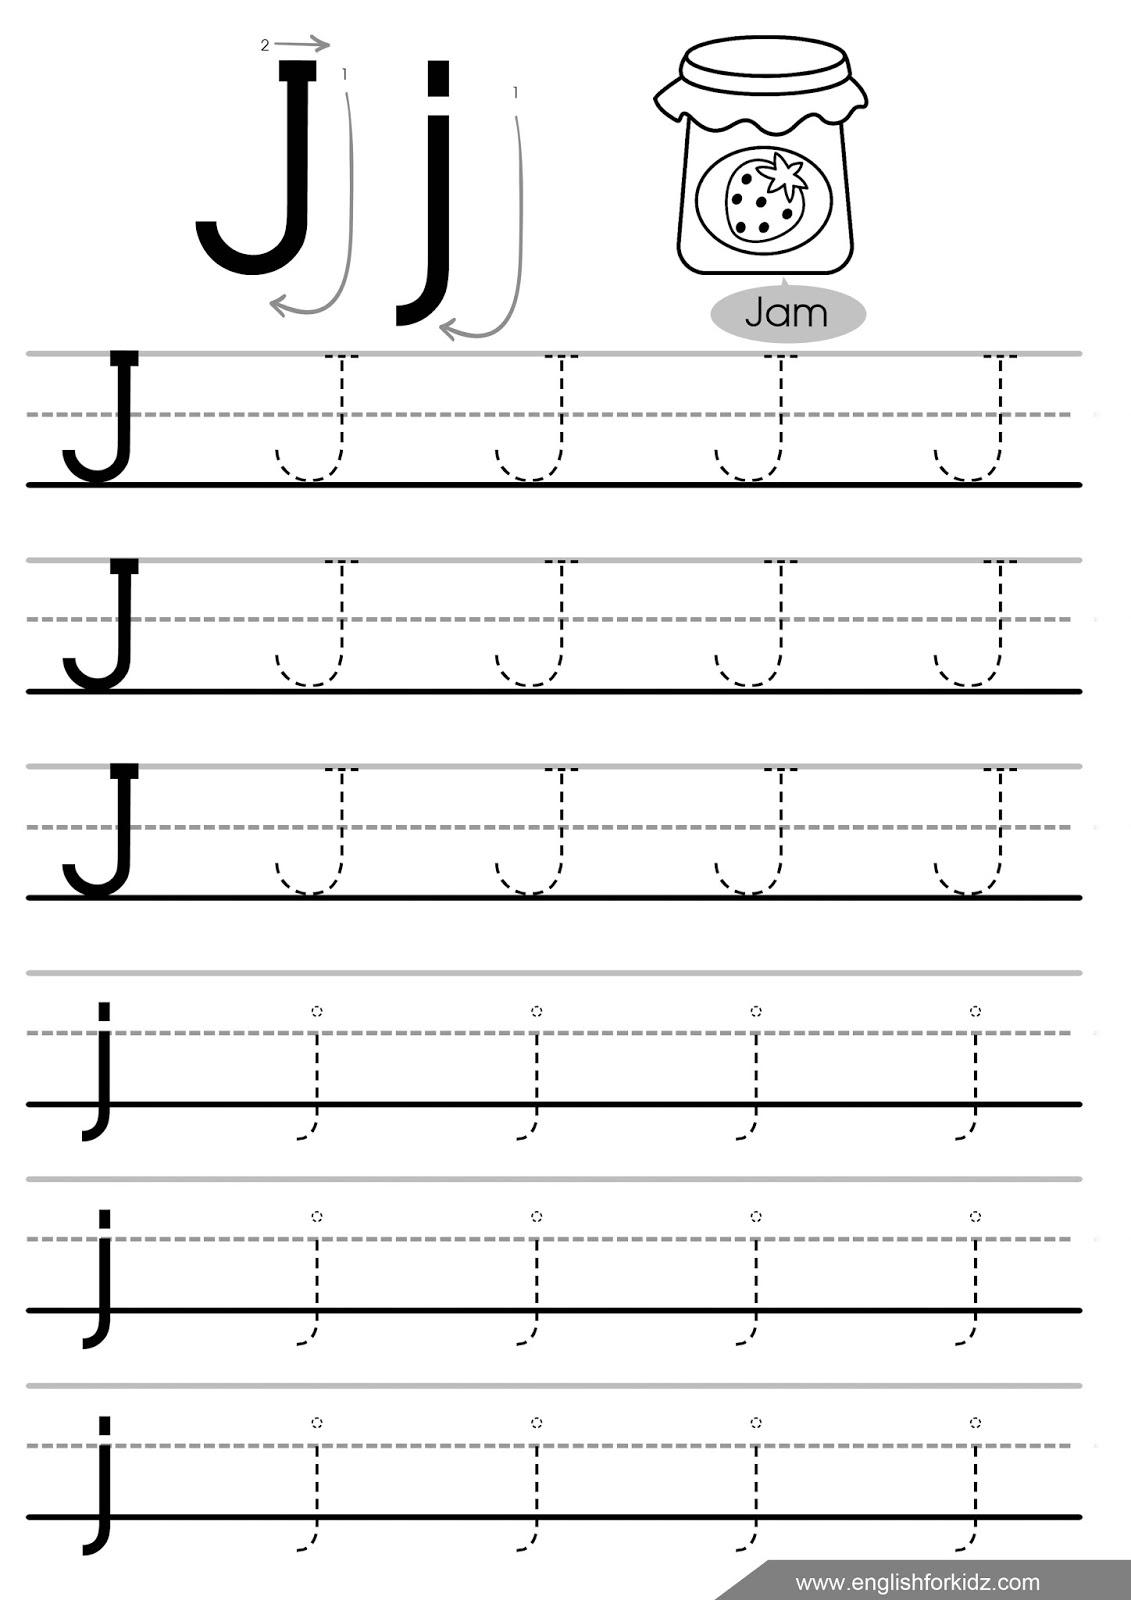 Printable Preschool Worksheets Letter J - Clover Hatunisi with Letter J Worksheets Printable